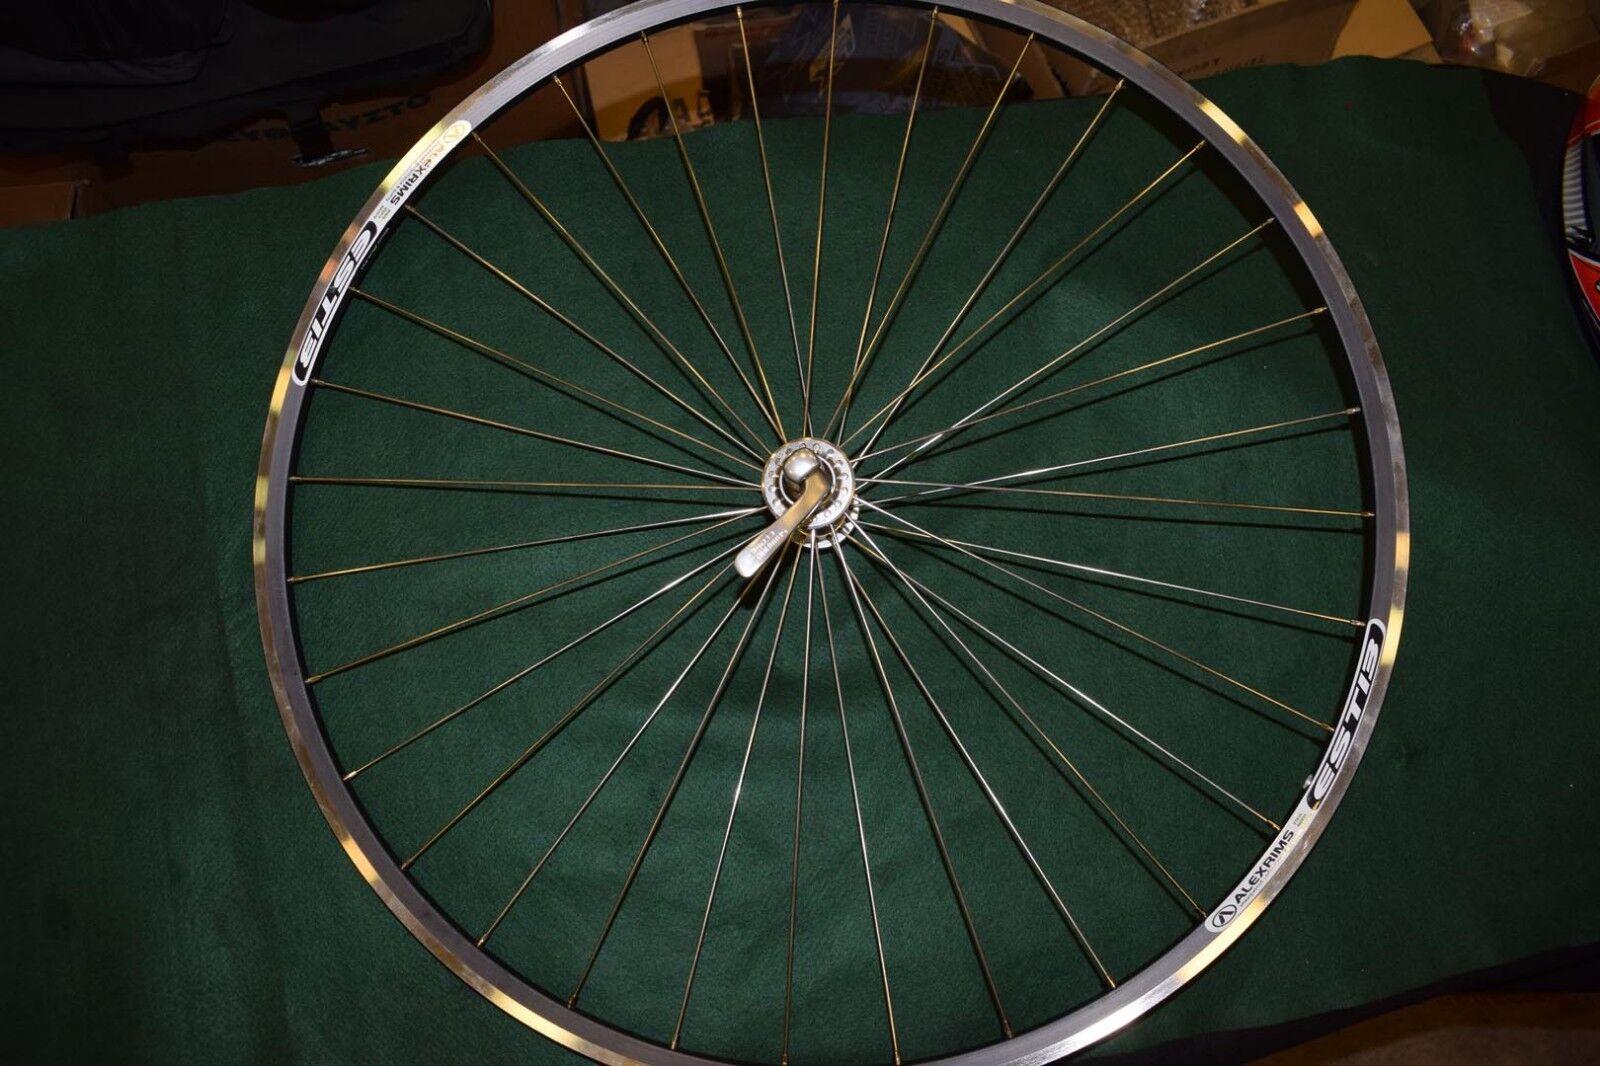 Alexrims & Shimano Ultegra hub 700C front road racing wheel 622x13 alloy 660g